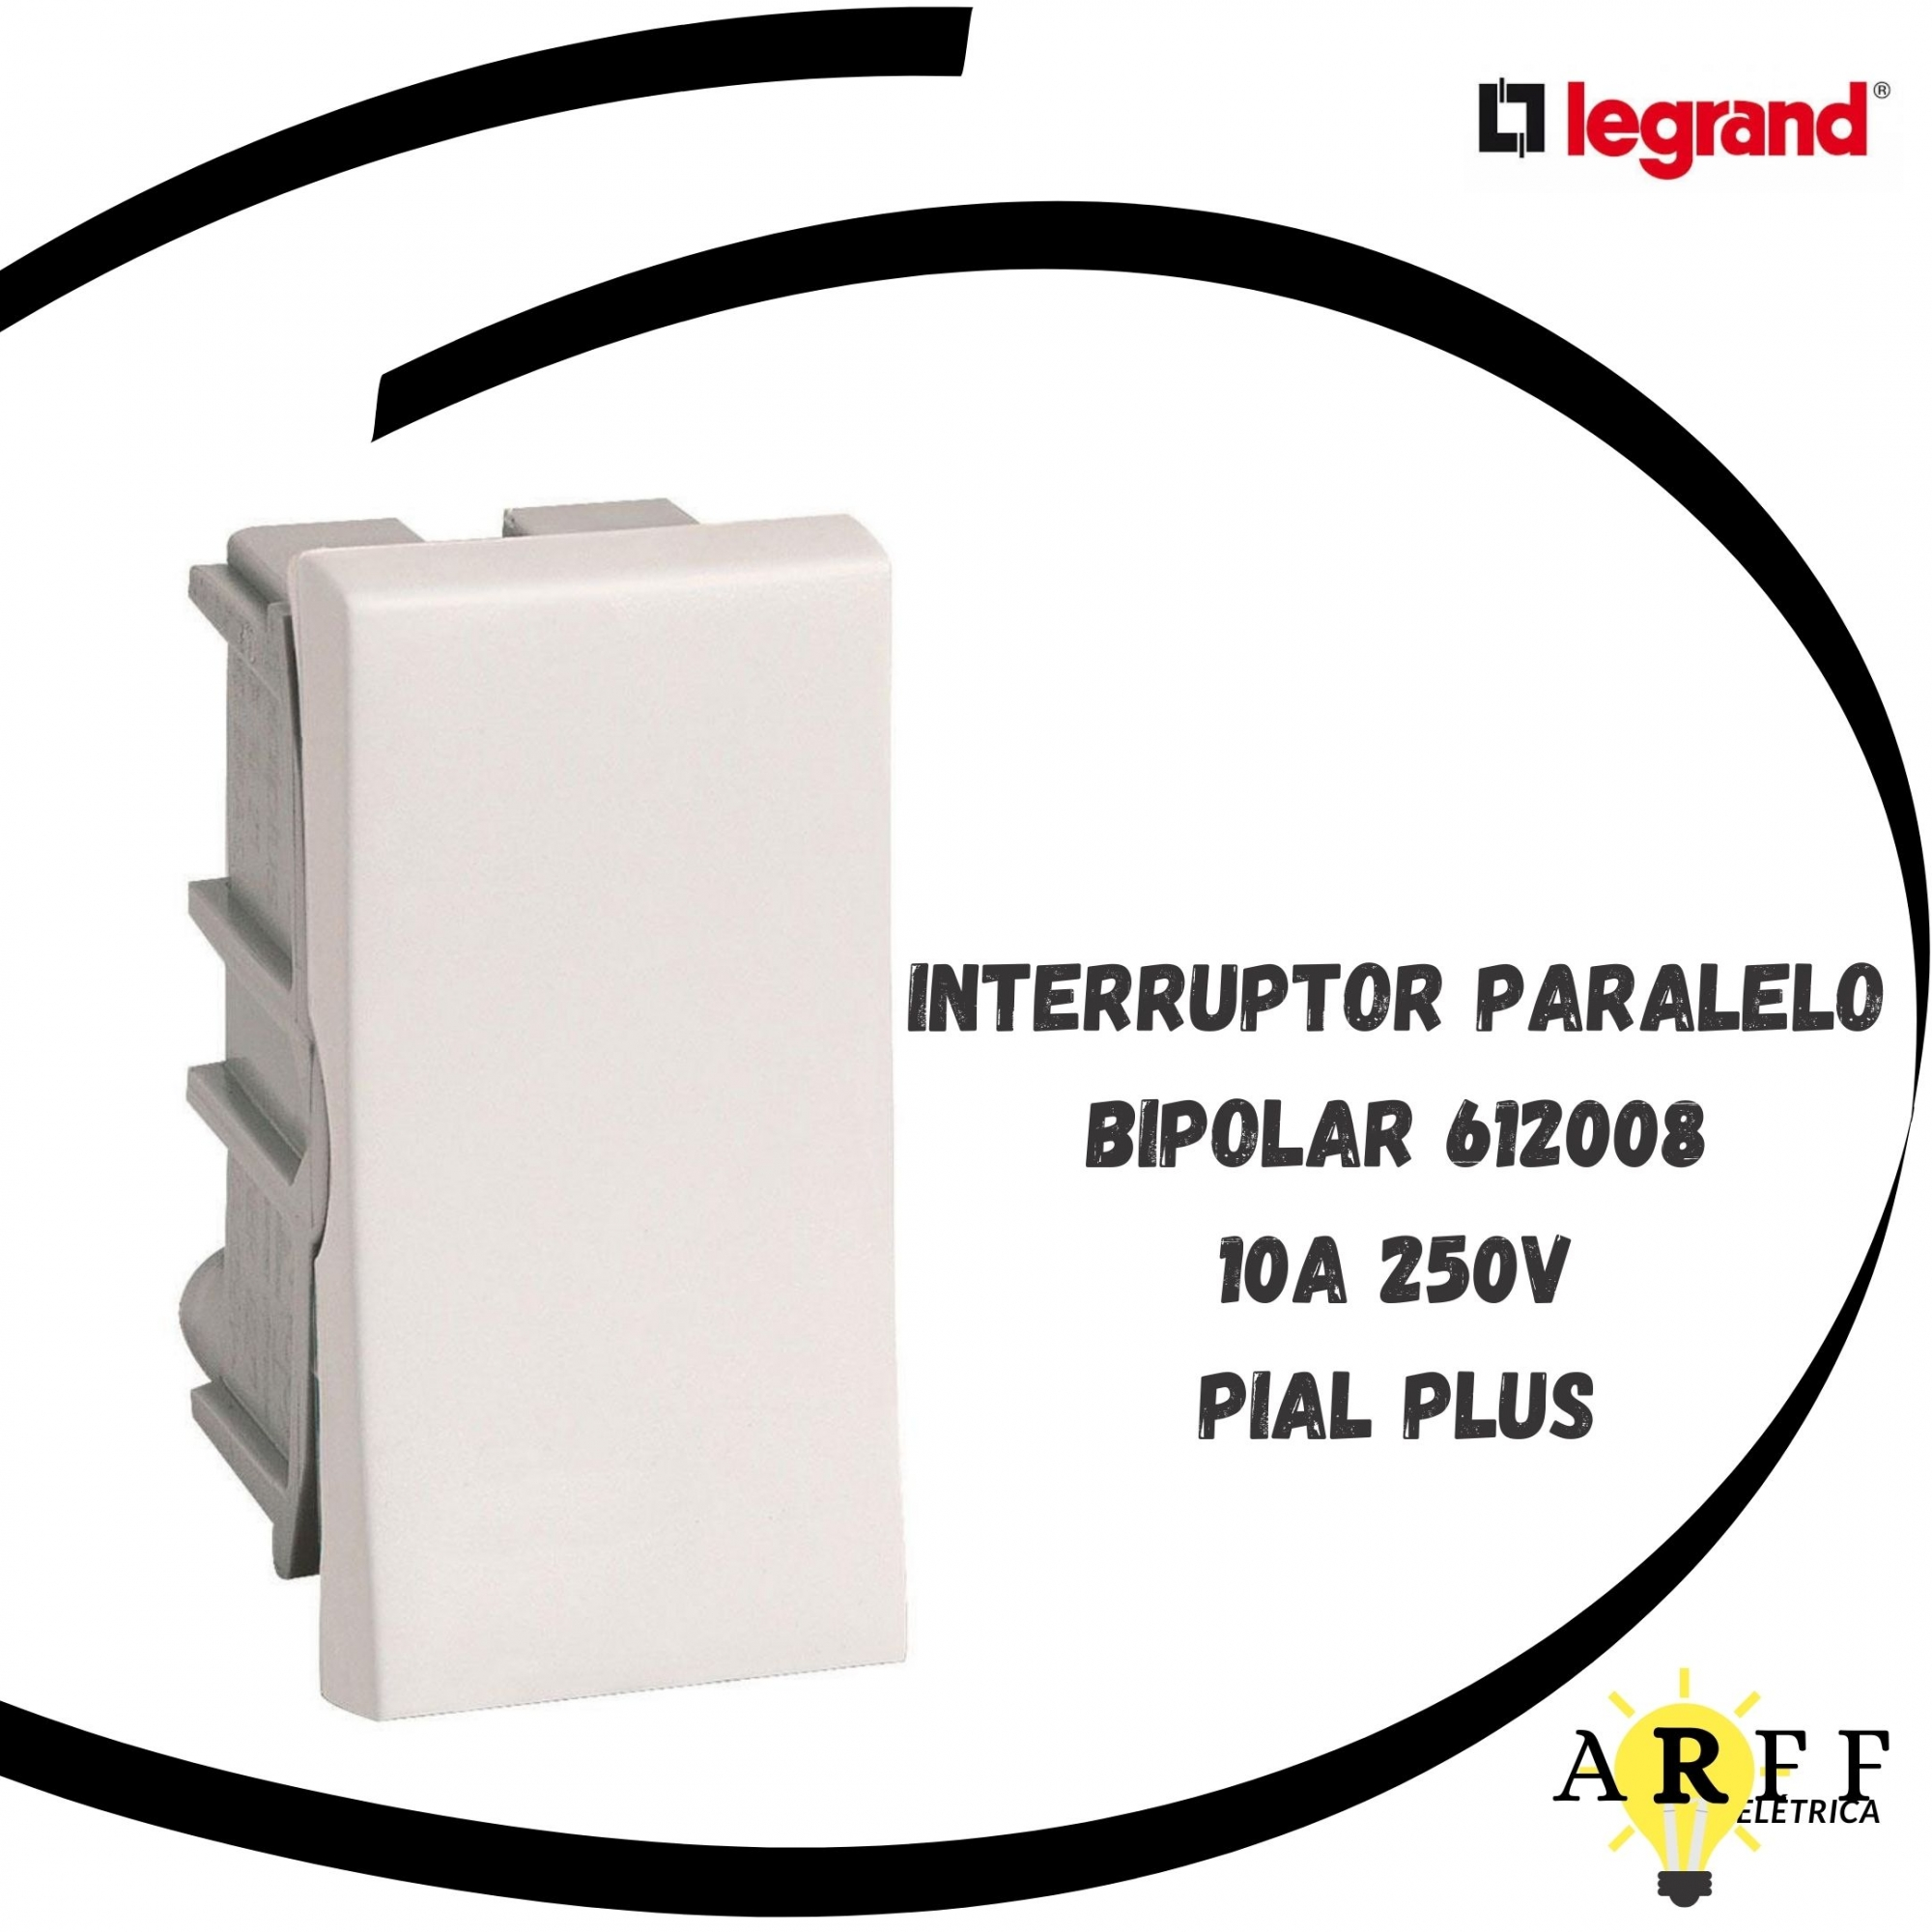 612008 Interruptor Paralelo Bipolar 10A 250V PIAL PLUS LEGRAND